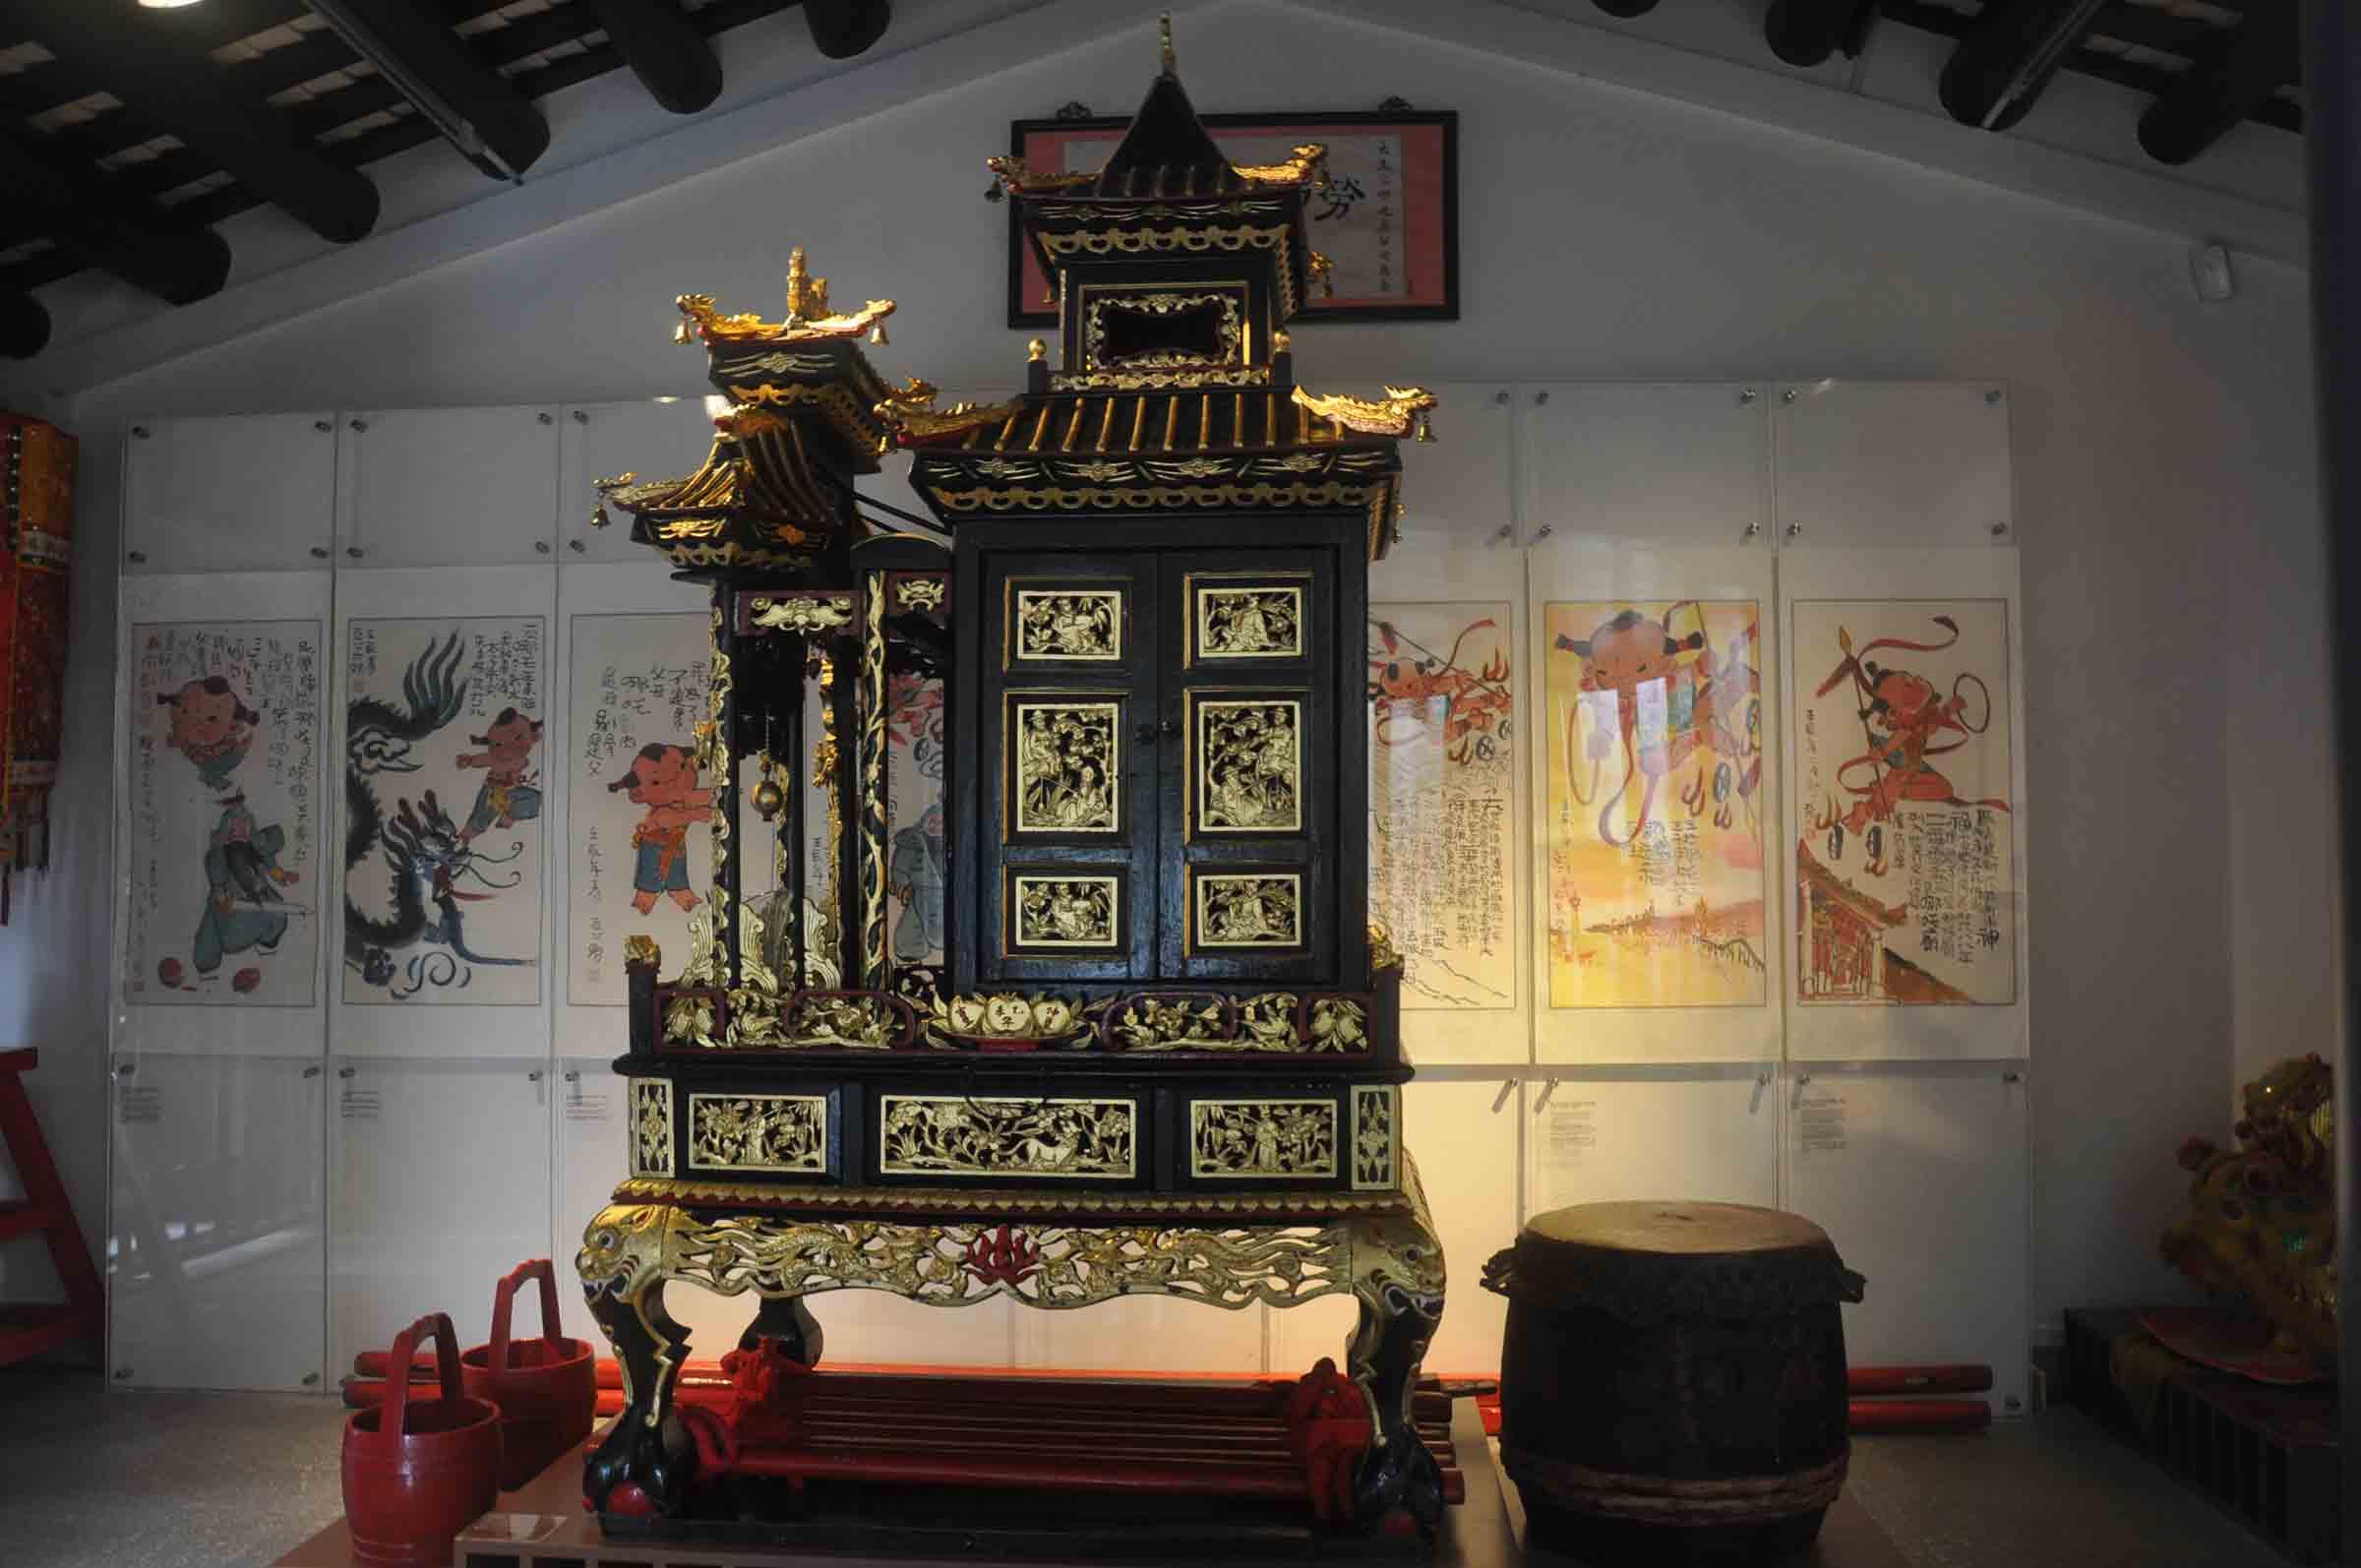 Na Tcha Temple museum